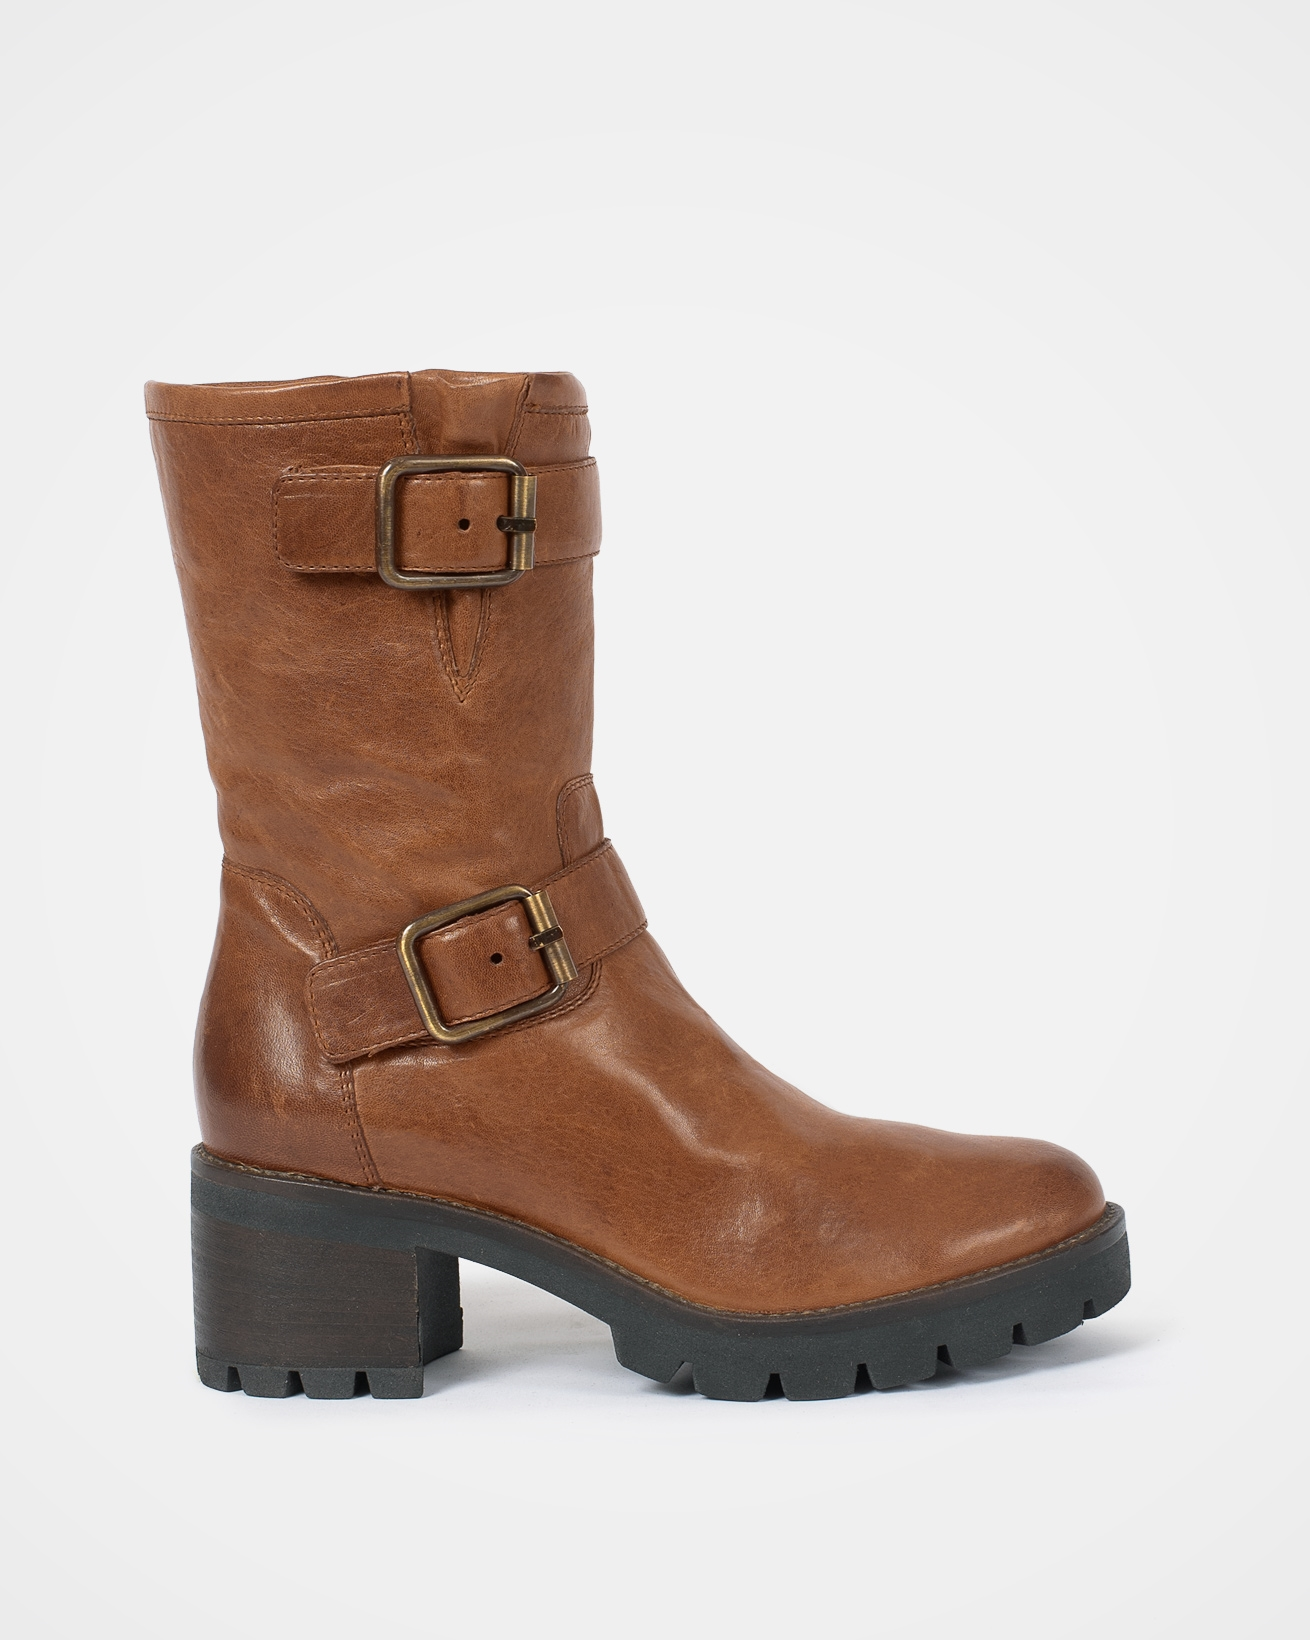 7724-block-heel-biker-boot-antique-brown-outside-web-lfs-rev.jpg